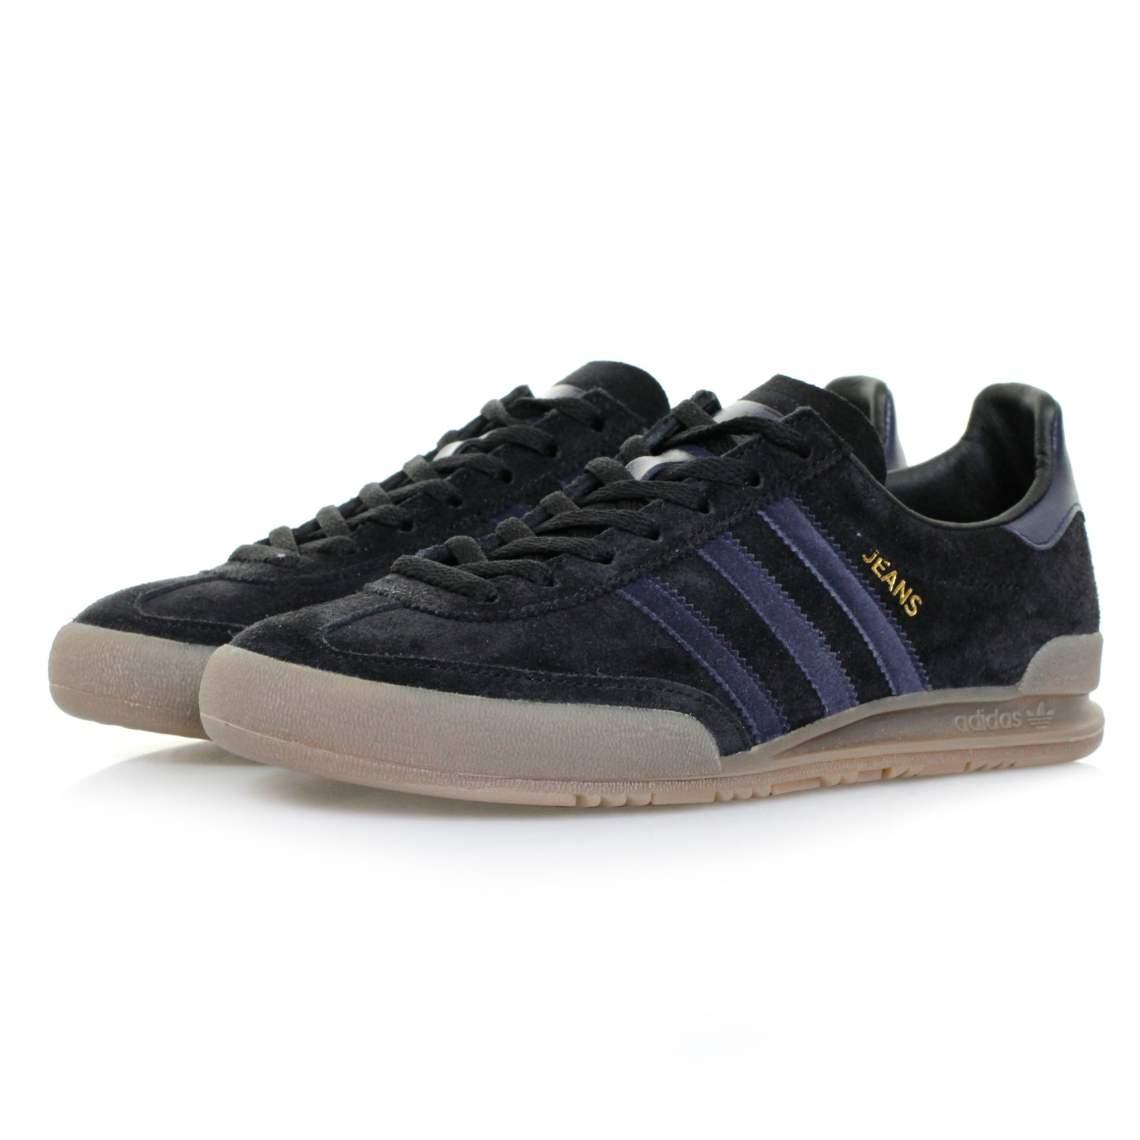 Adidas Originals Jeans 5